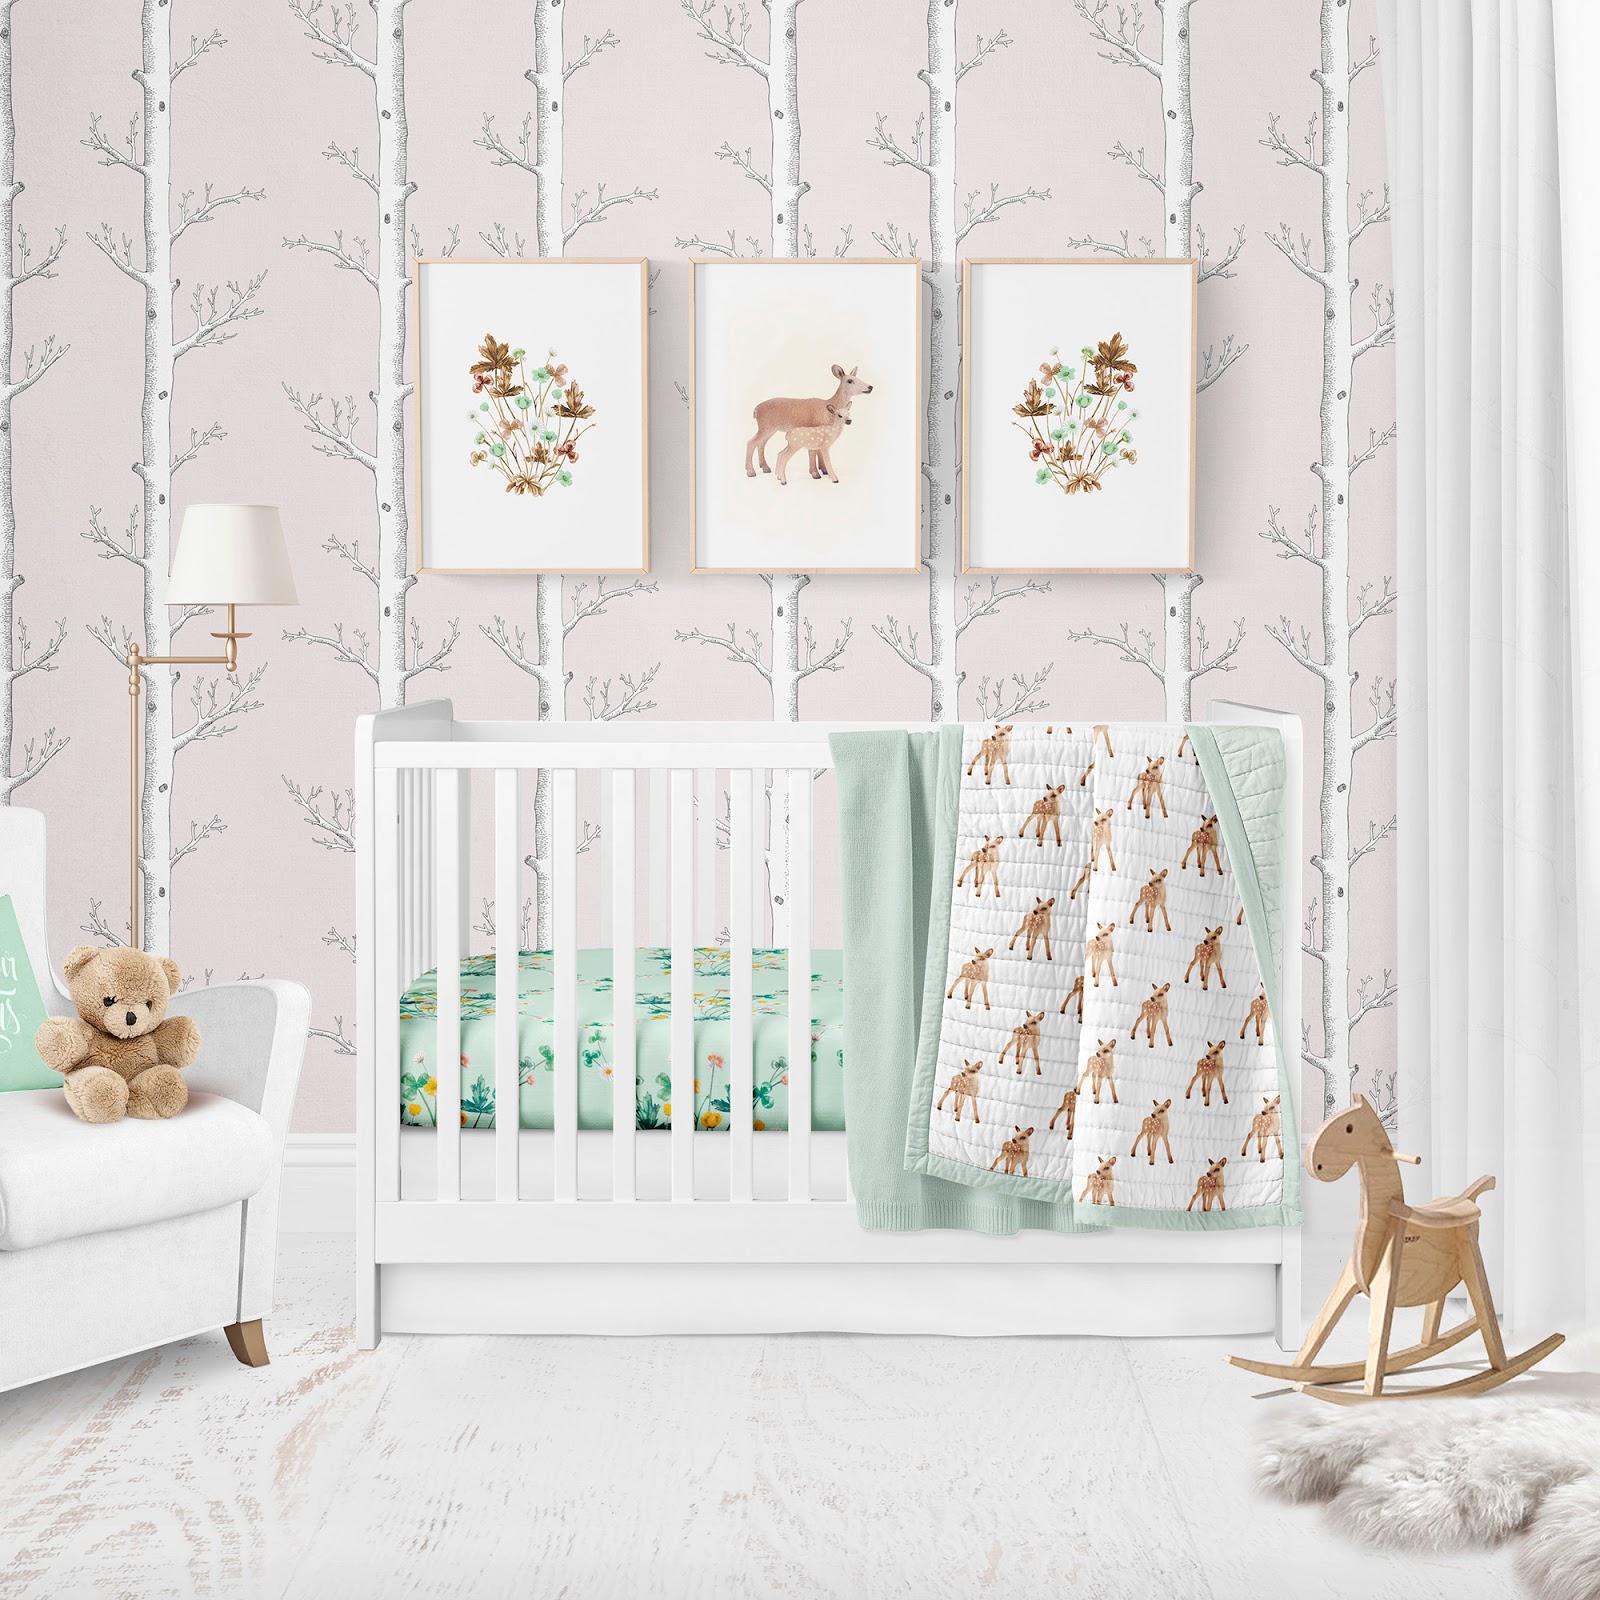 Modern Nursery Wallpaper: Modern Woodland Nursery, Gender Neutral Fabric And Wallpaper